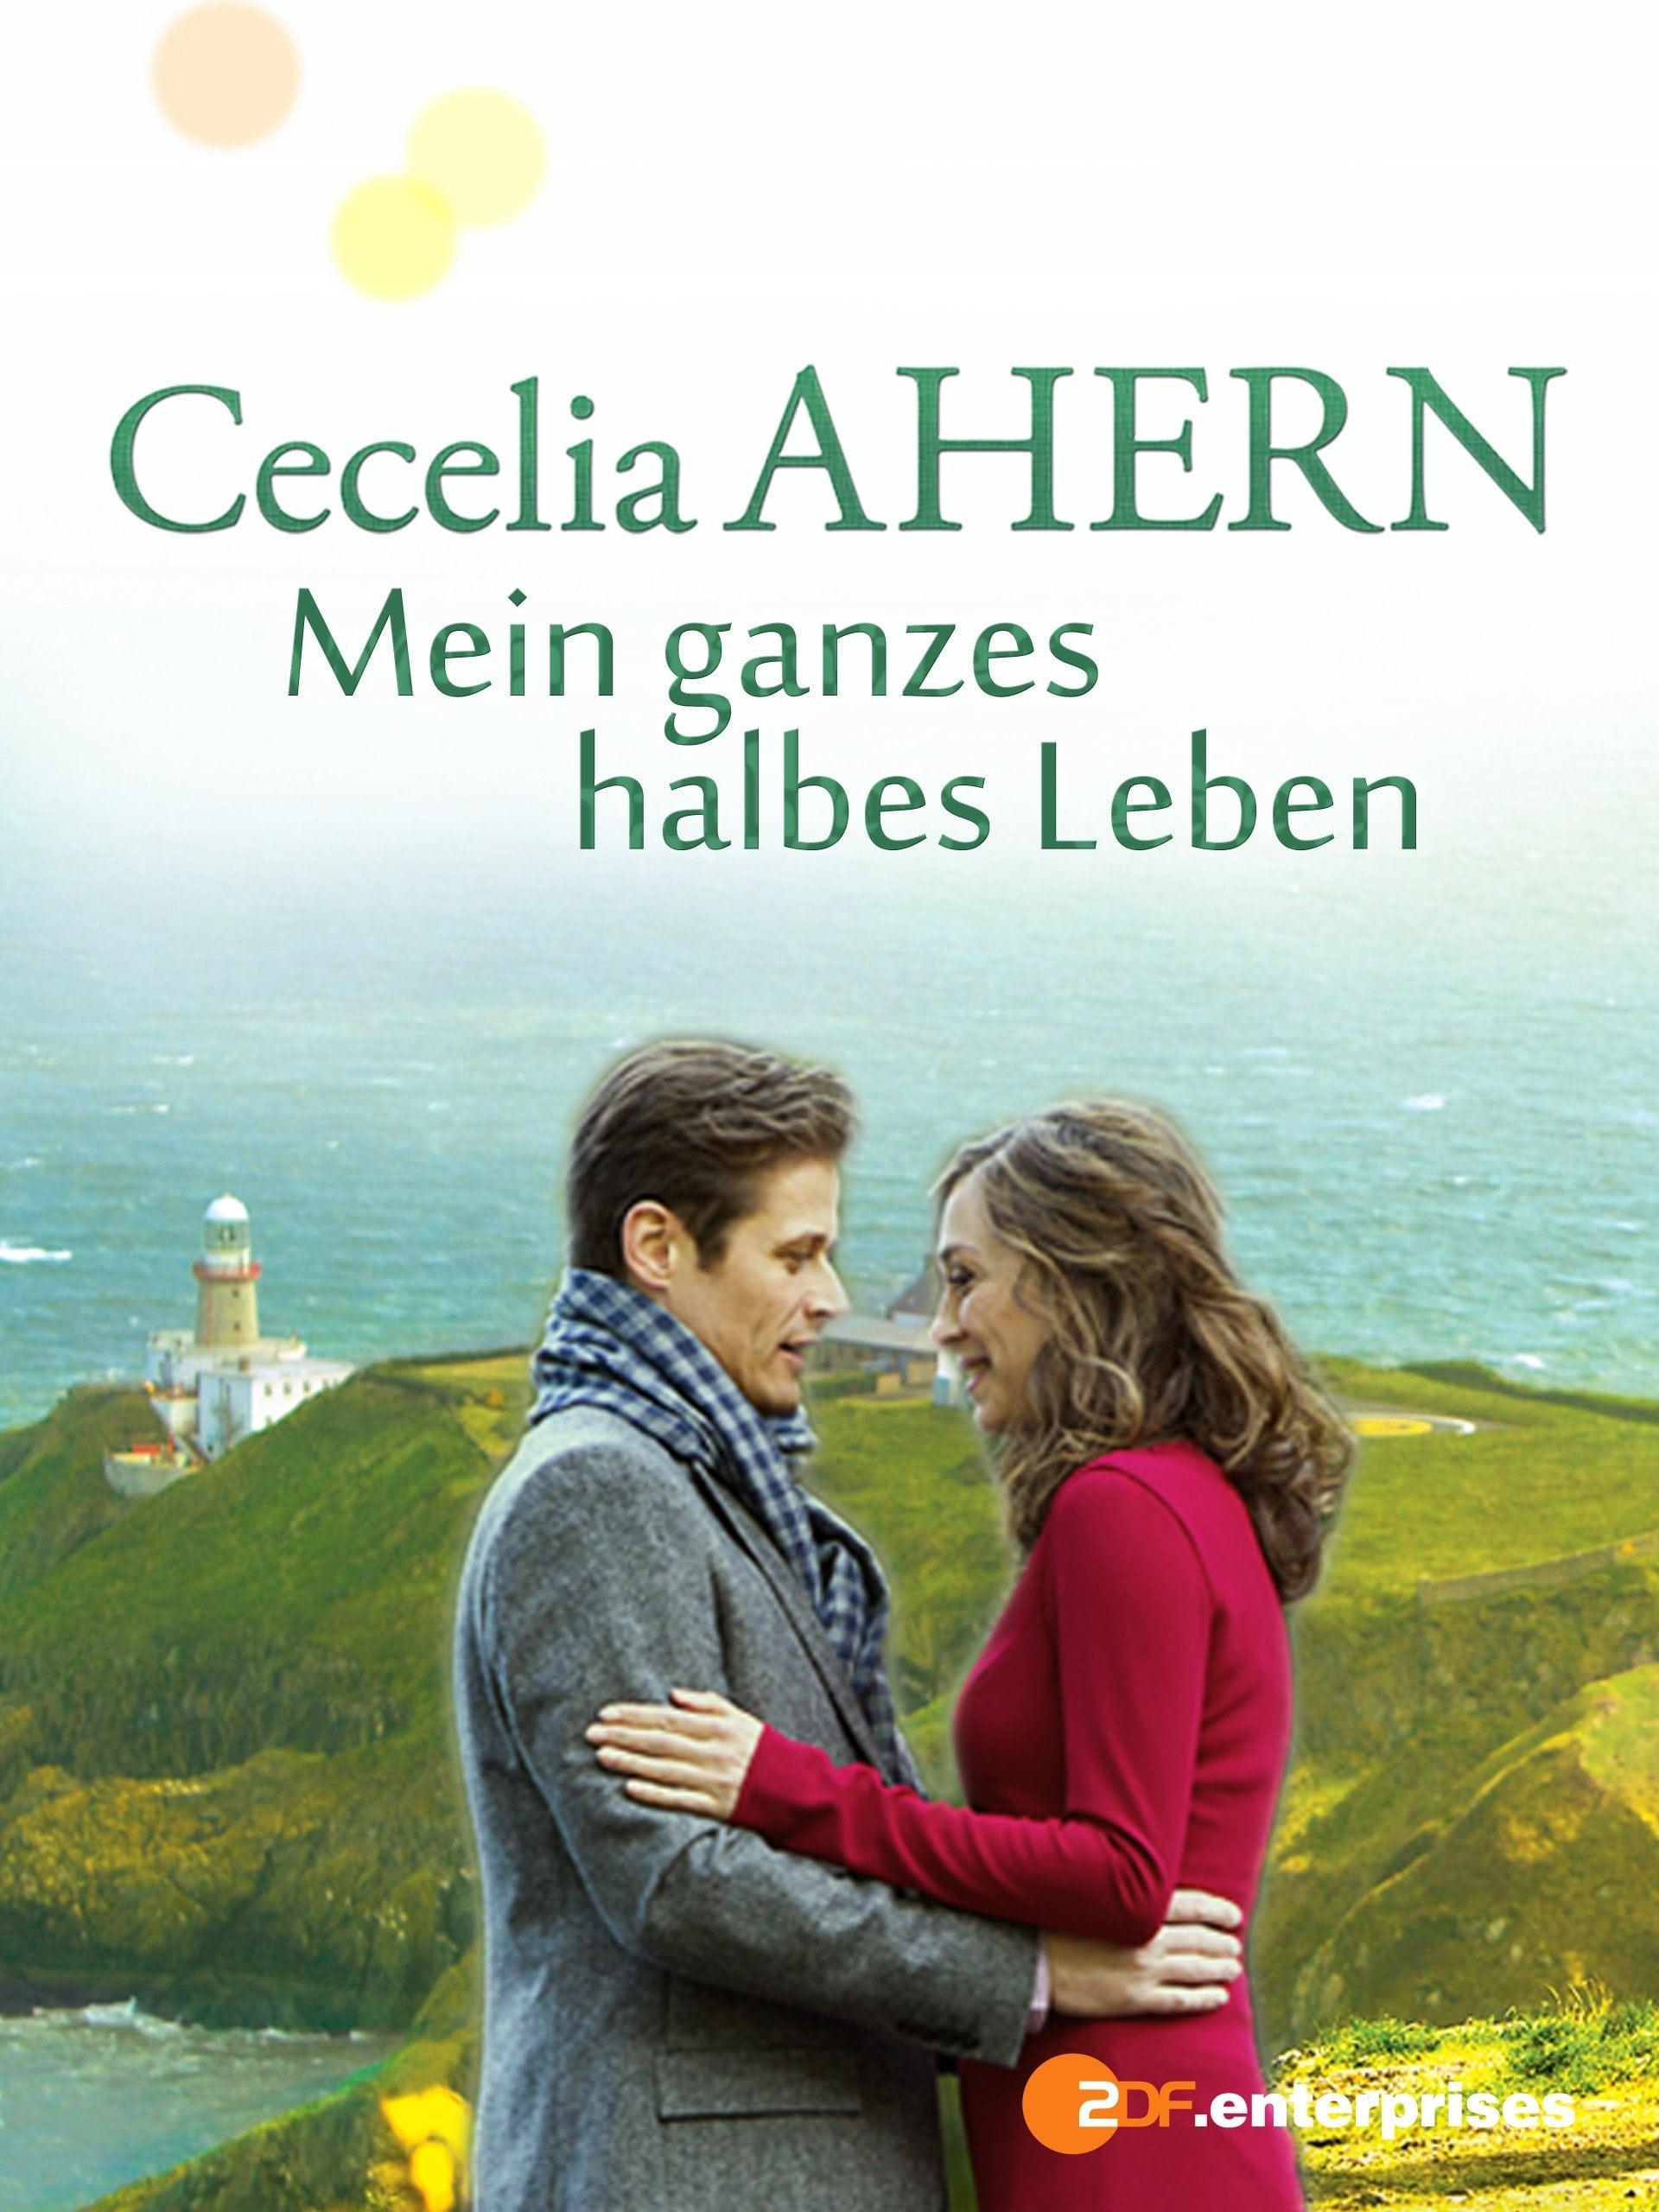 Cecelia Ahern: Mein ganzes halbes Leben